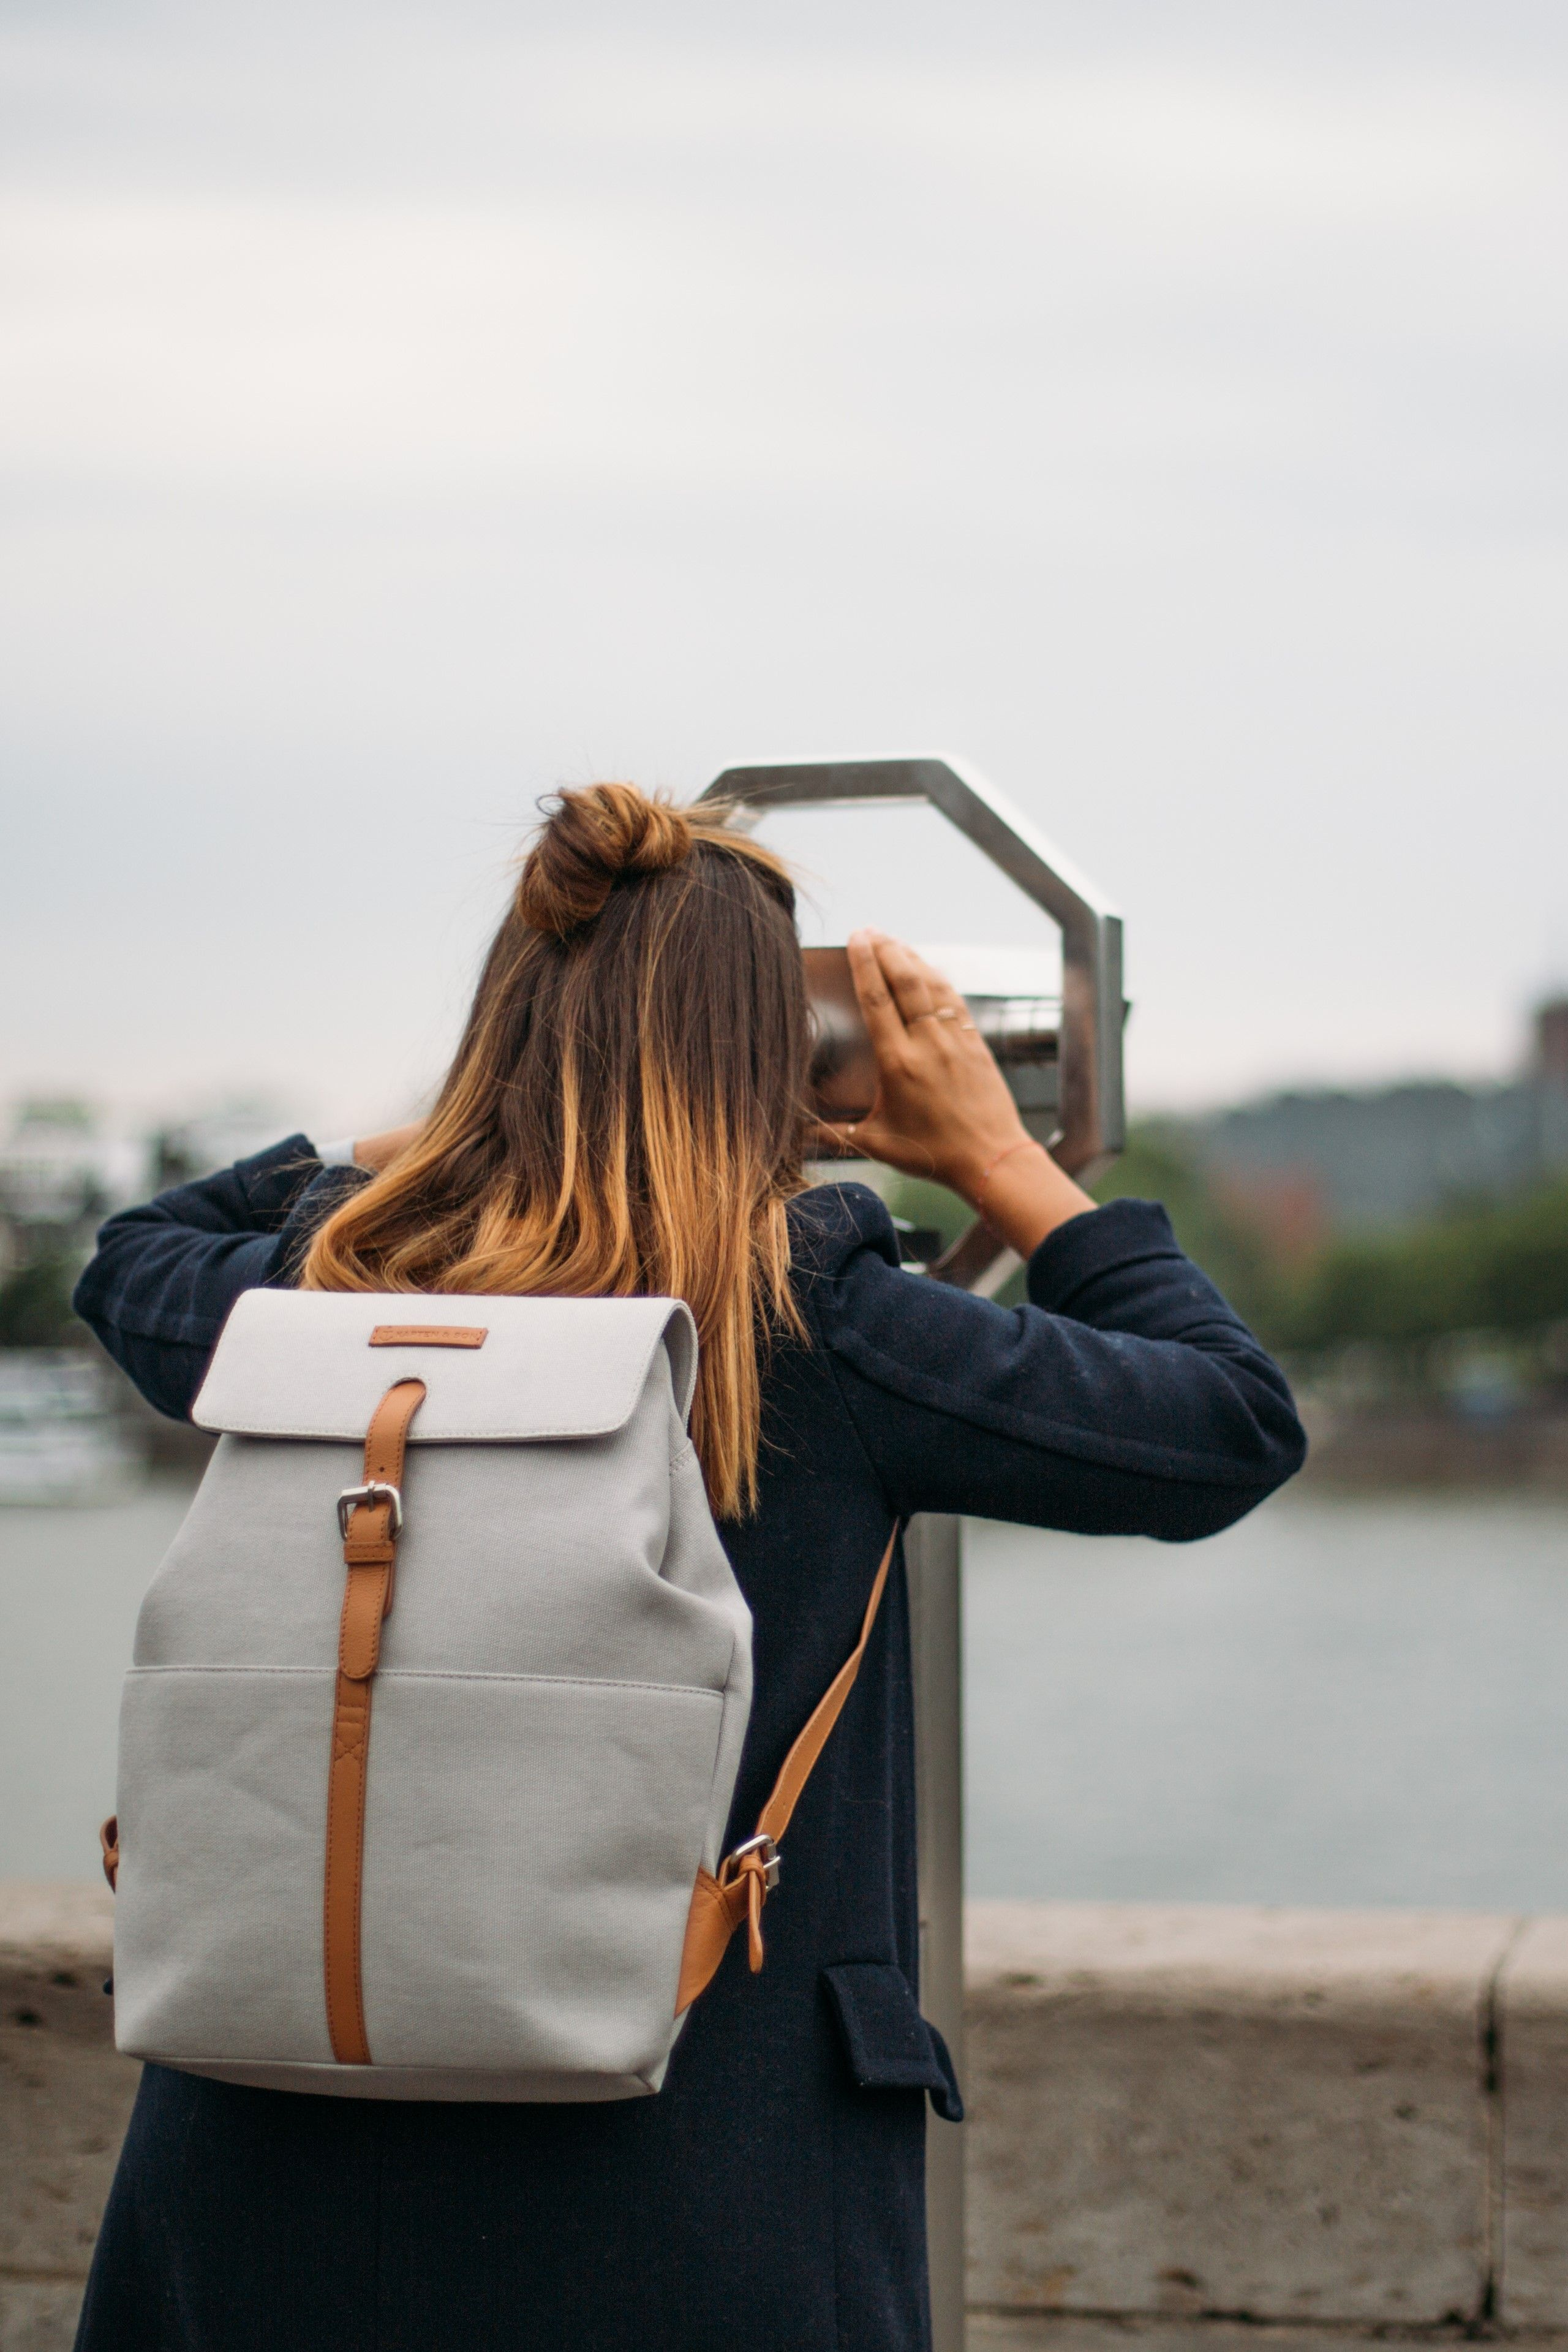 Scandinavian Backpack Minimalist School College University Travel Backpack Vegan Backpack Rucksack Feminin Backpac Carteras Bolso Mochila Bolso